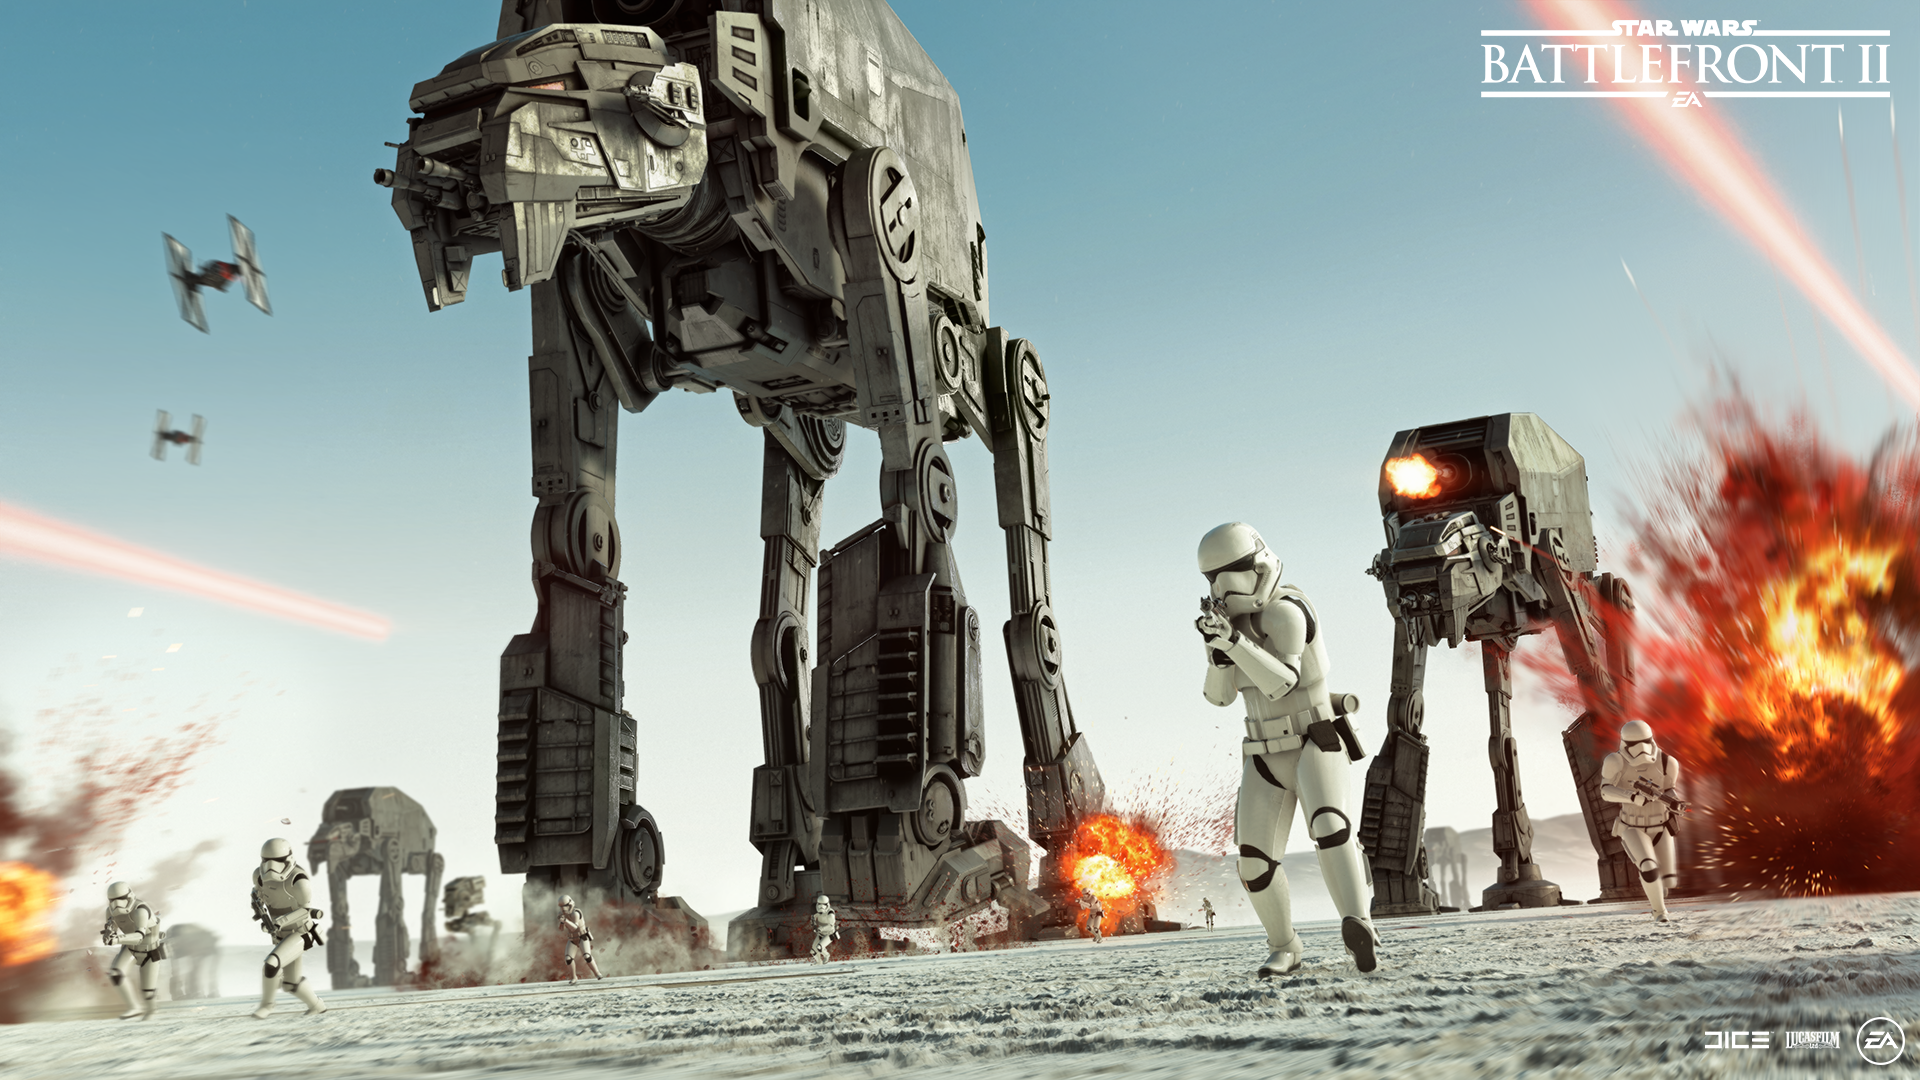 Battlefront 2 Anakin skywalker release